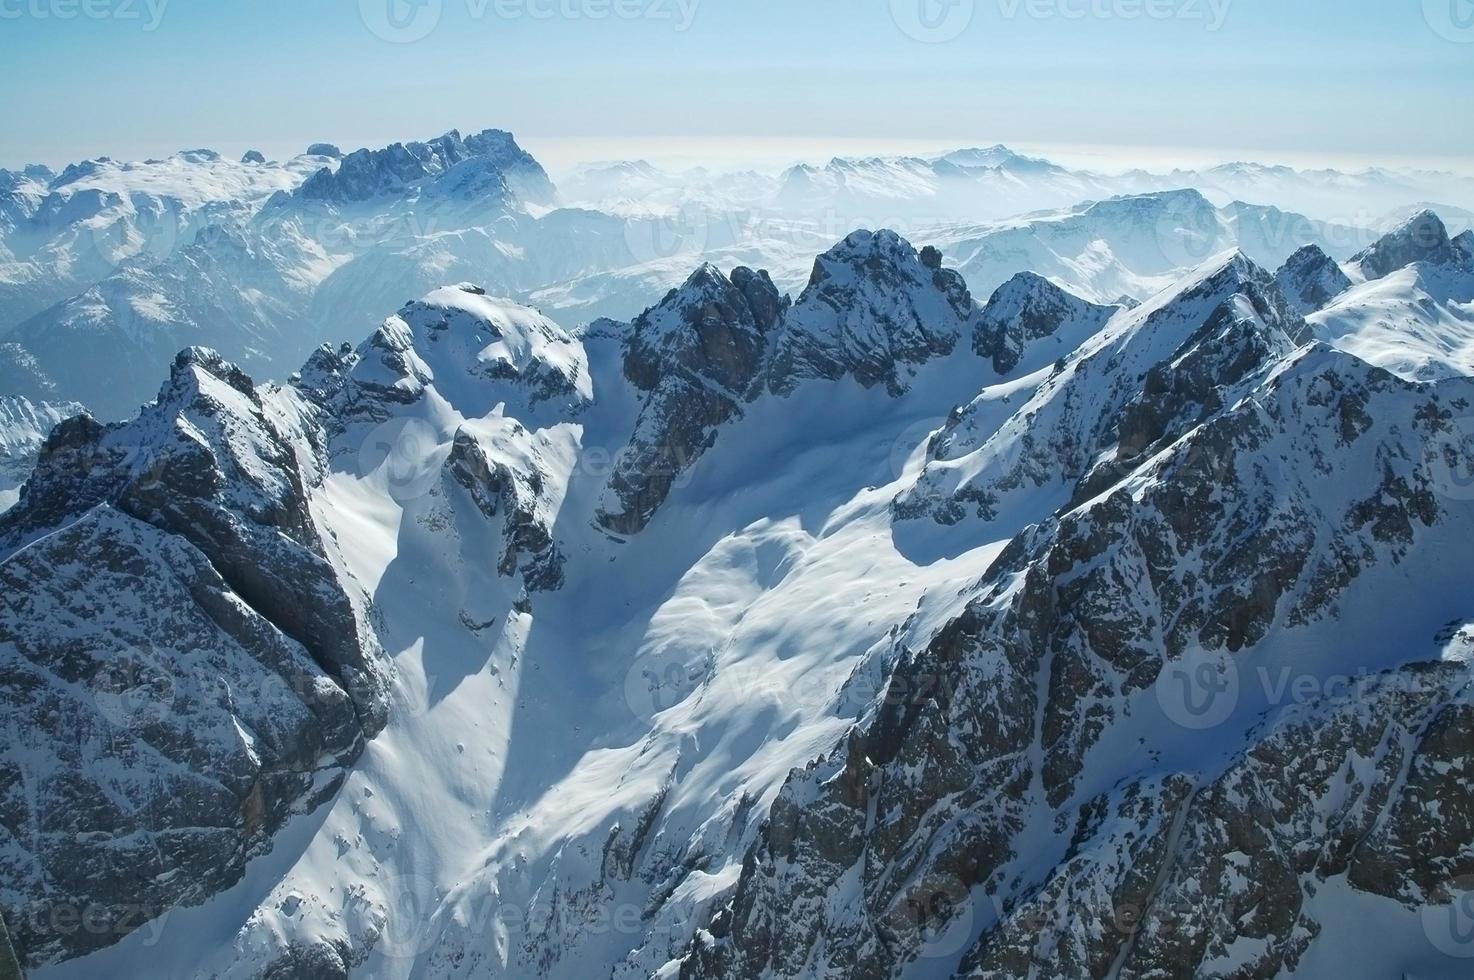 montagnes des Dolomites en hiver, station de ski en Italie photo